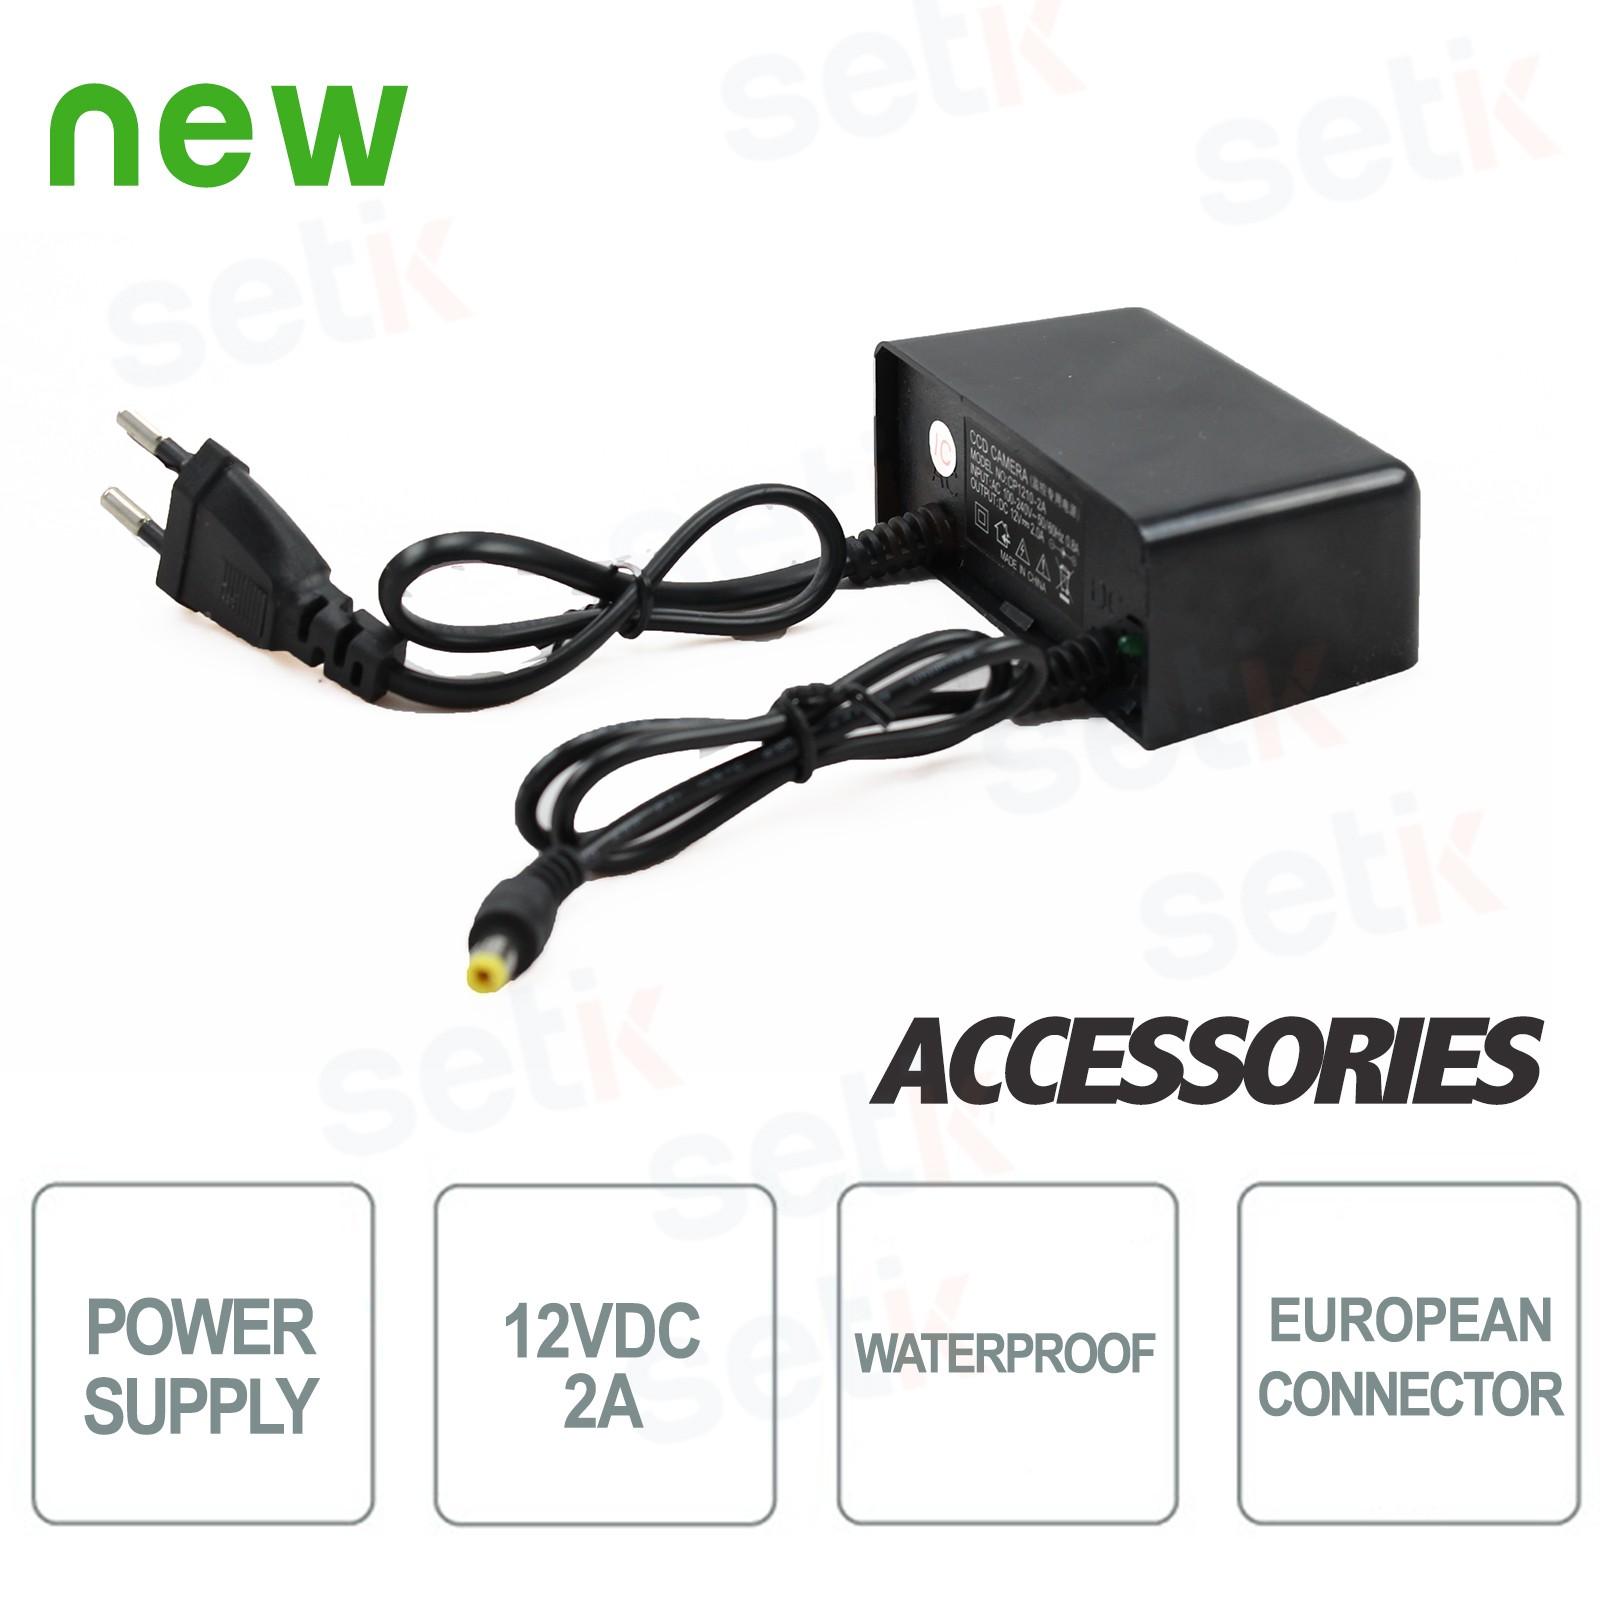 Alim2awp 12v 2a Power Supply For Cctv Cameras Waterproof Setik Underwater Camera Wiring Diagram Prices